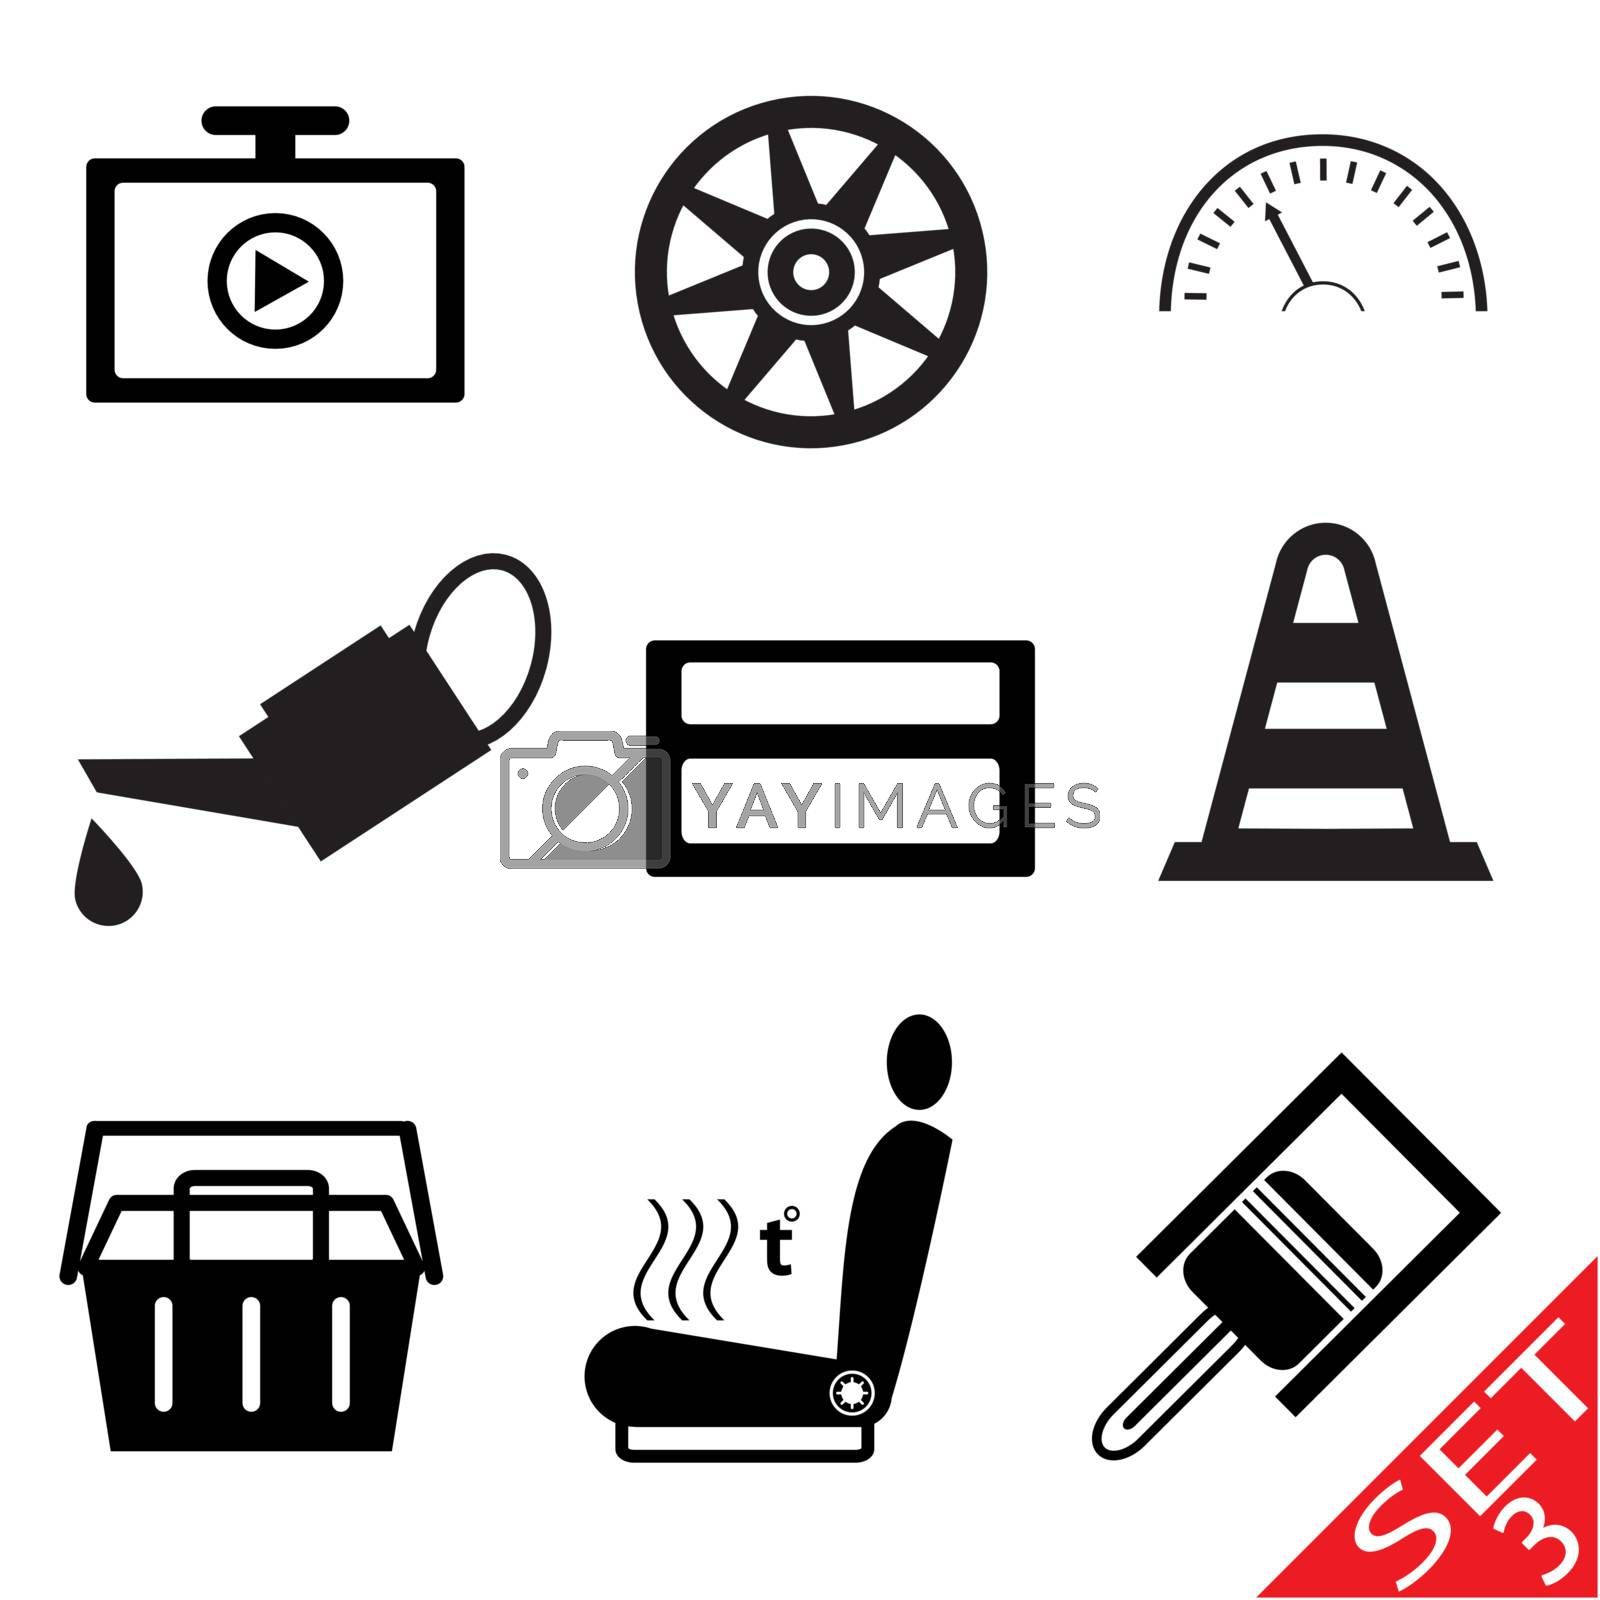 Car part icon set 3 by smoki